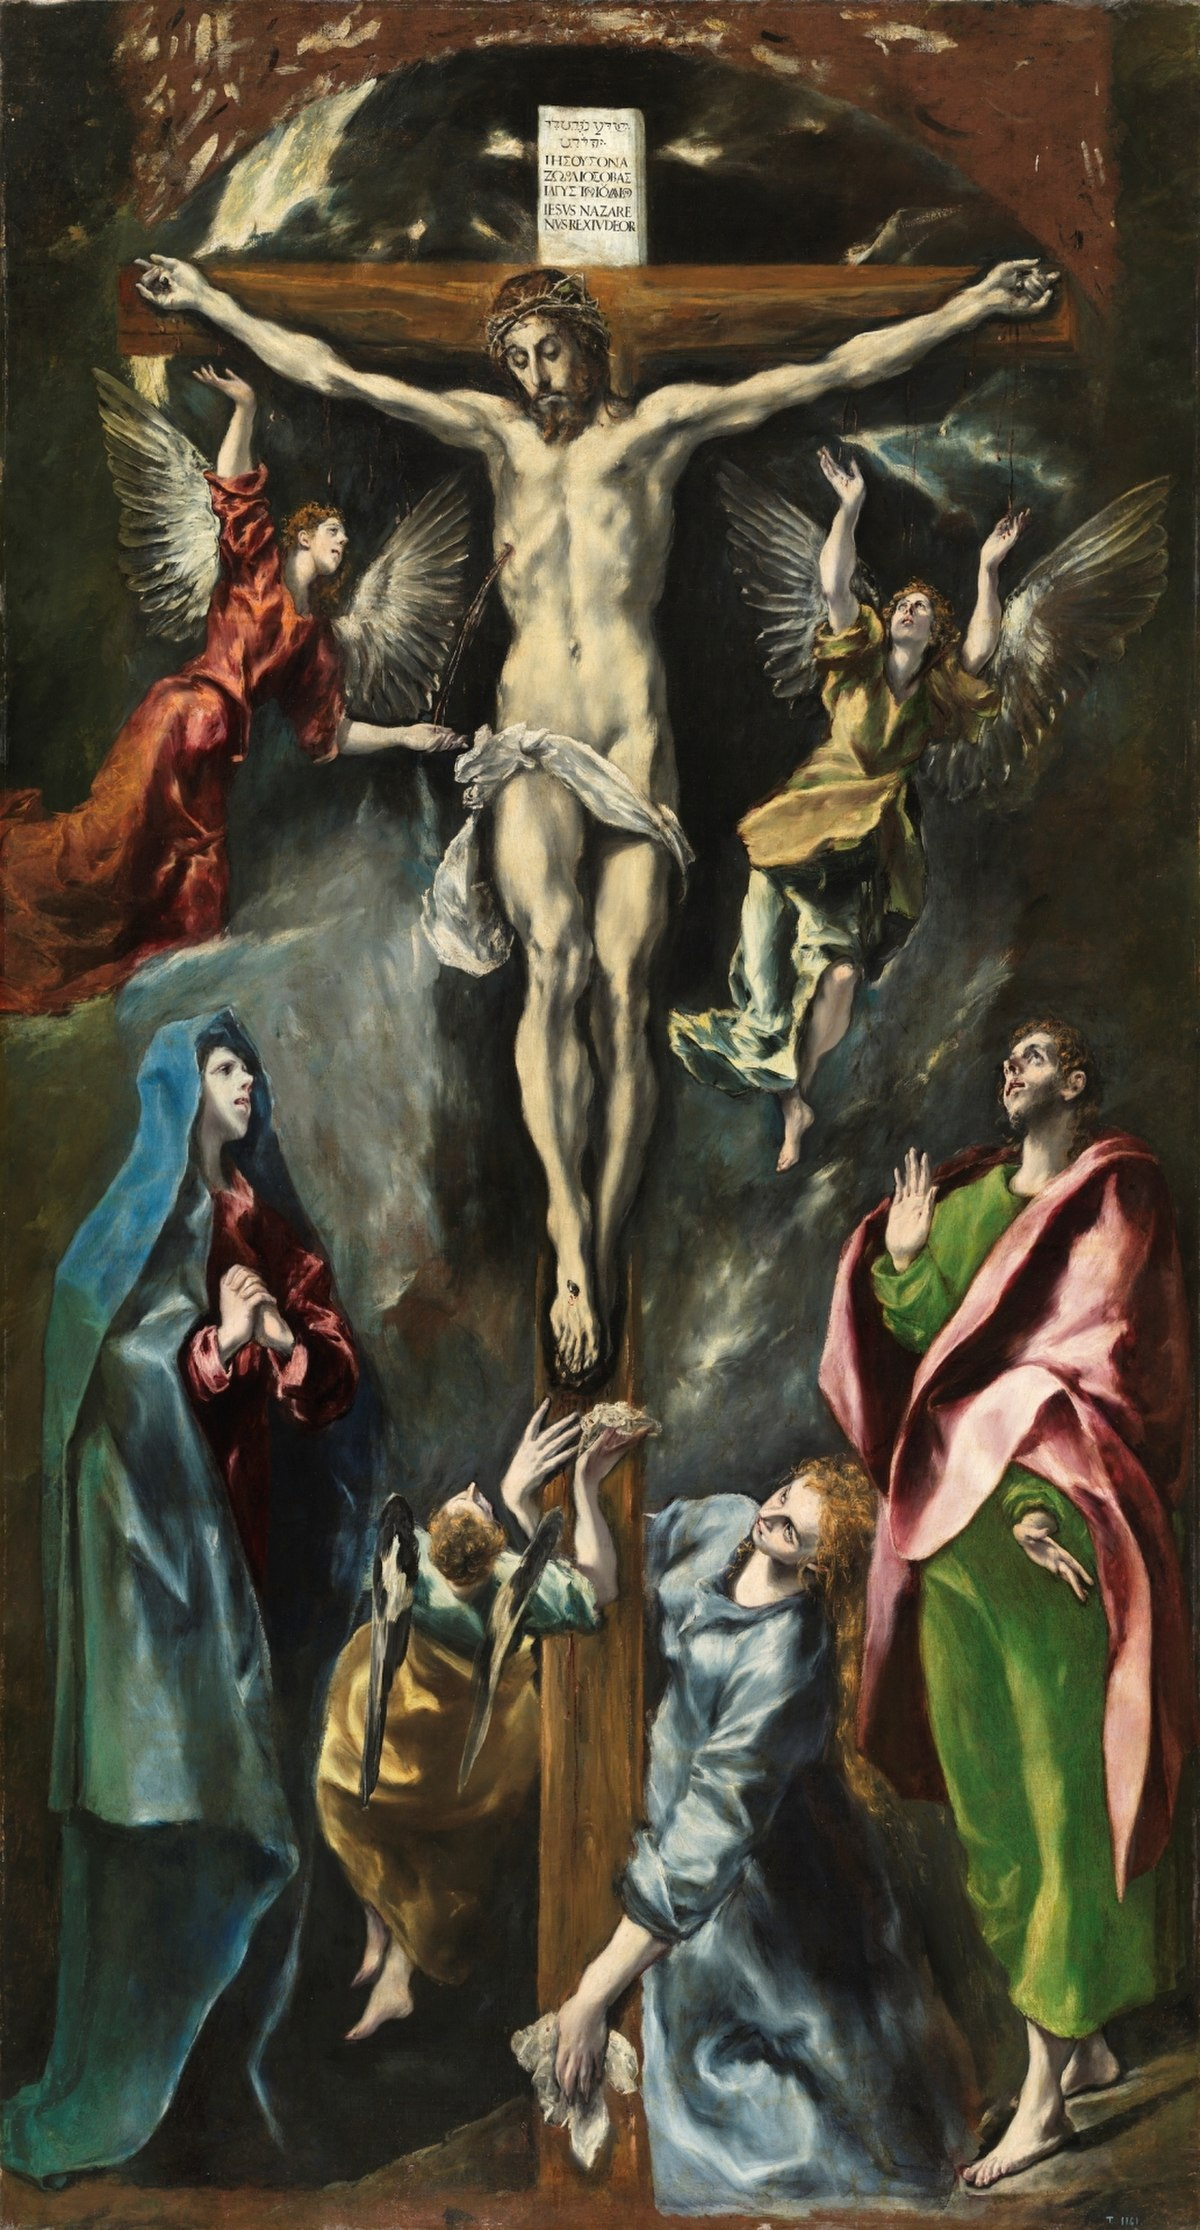 La crucifixi n el greco wikipedia la enciclopedia libre - Nombres de cuadros famosos ...